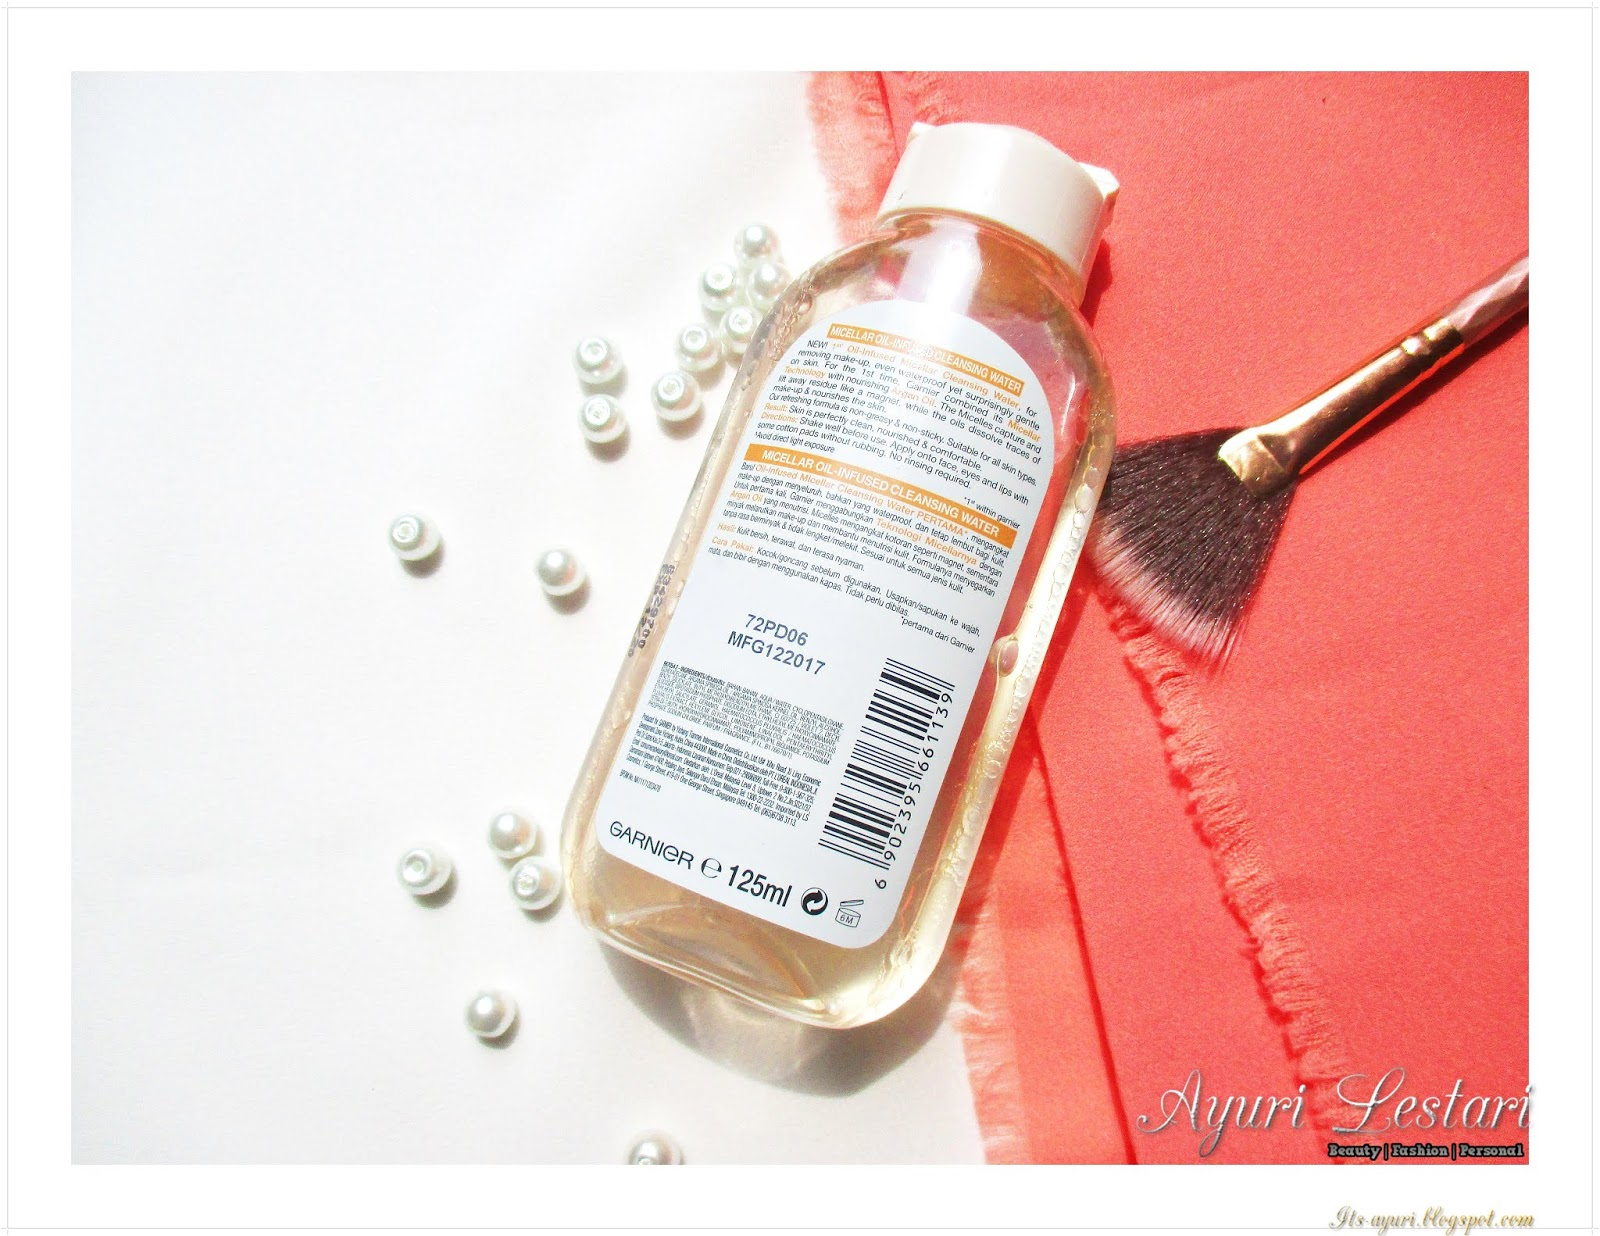 Garnier Oil-Infused Cleansing Water Review